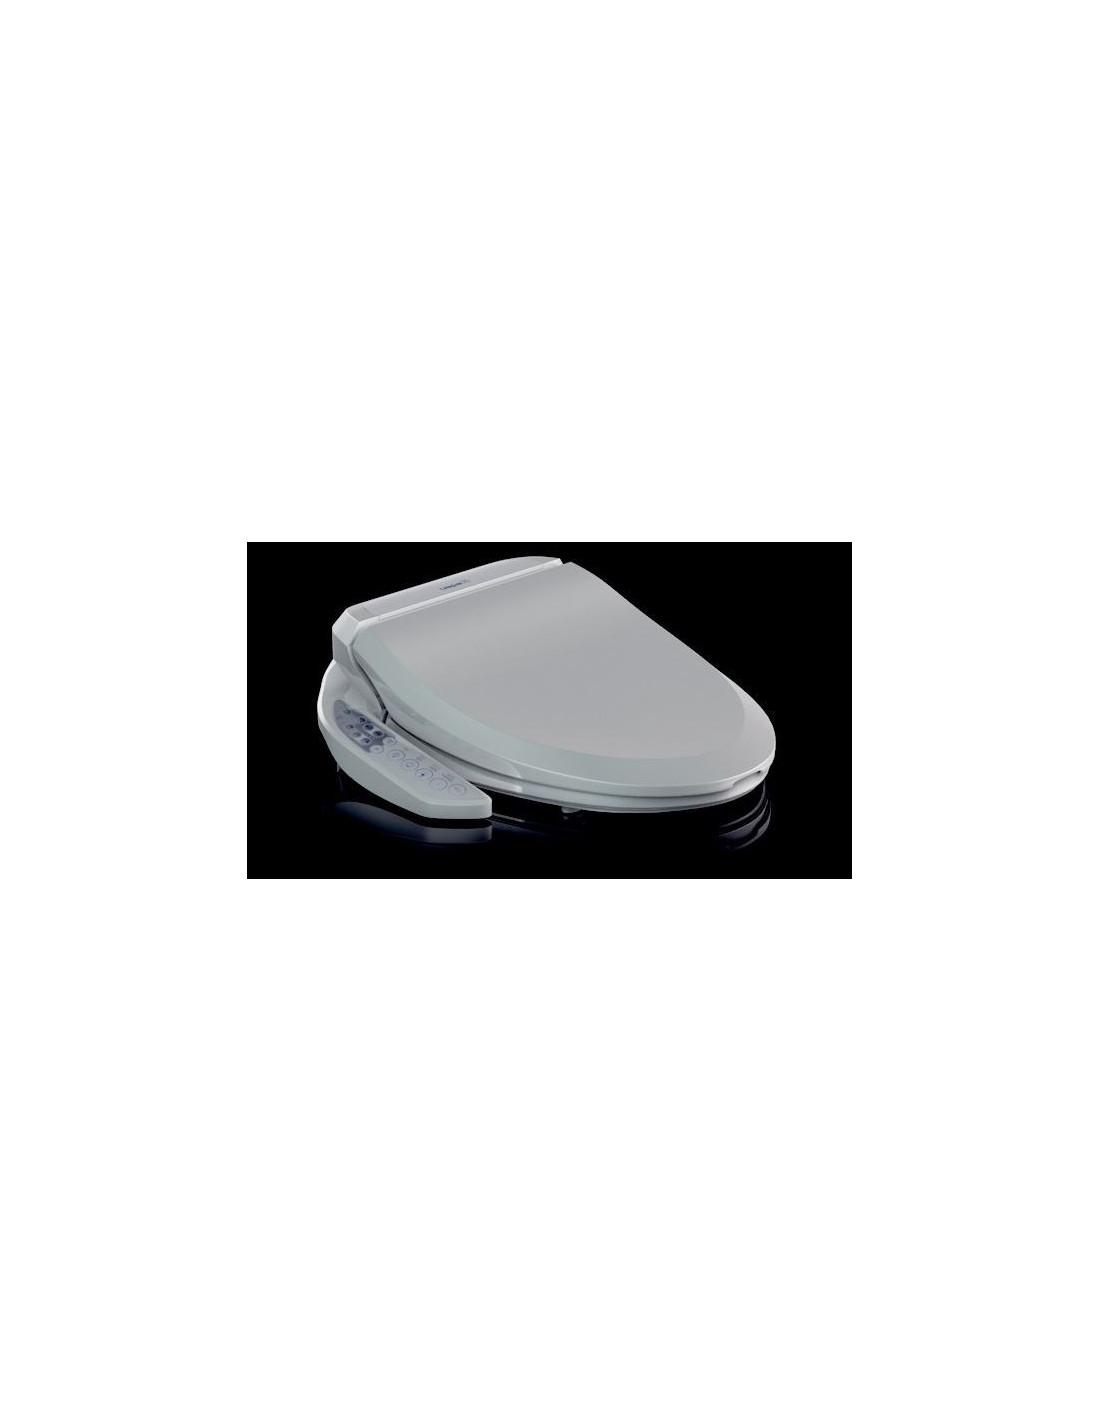 Tapa wc higiene ntima roca lucerna adaptable for Tapa water roca